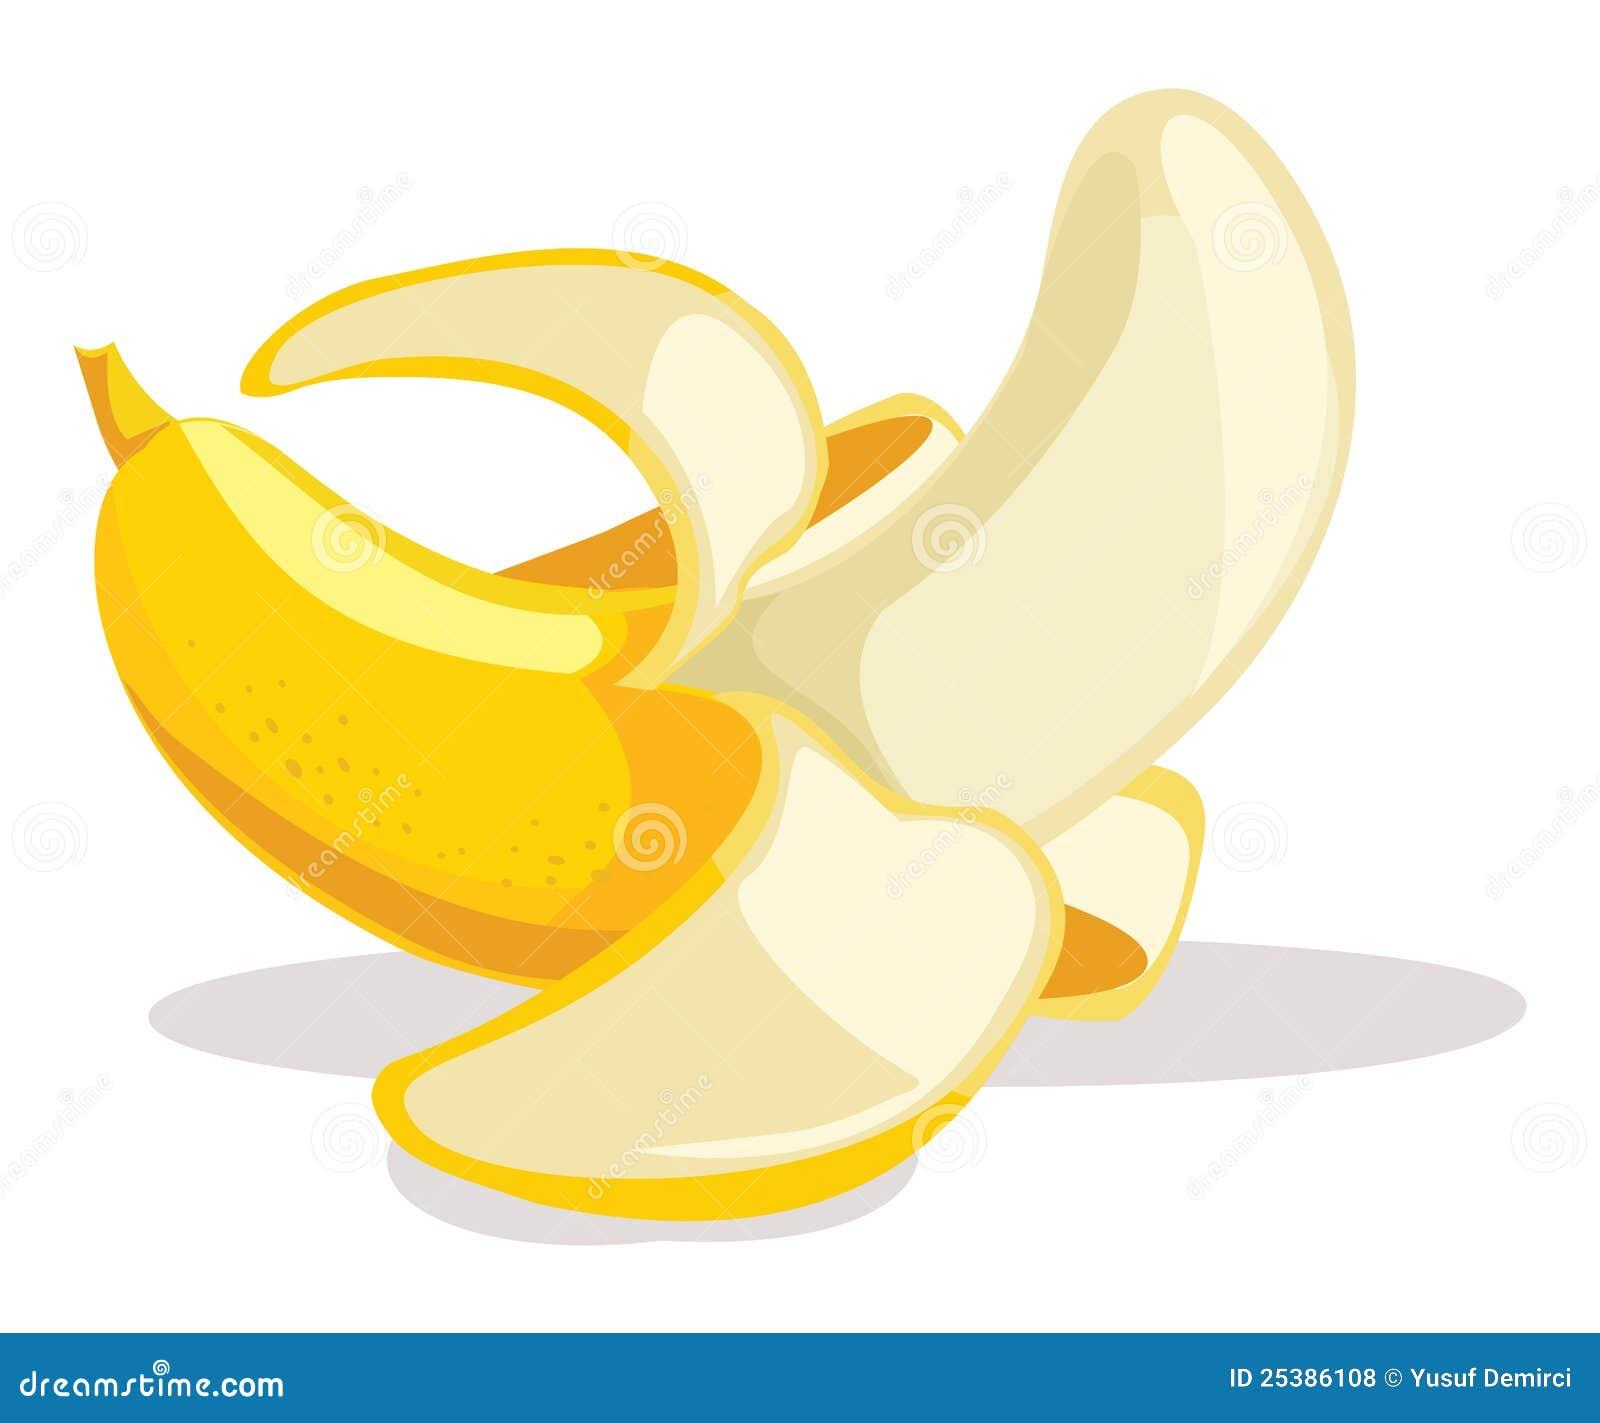 Ilustracao Do Vetor Da Banana Ilustracao Do Vetor Ilustracao De